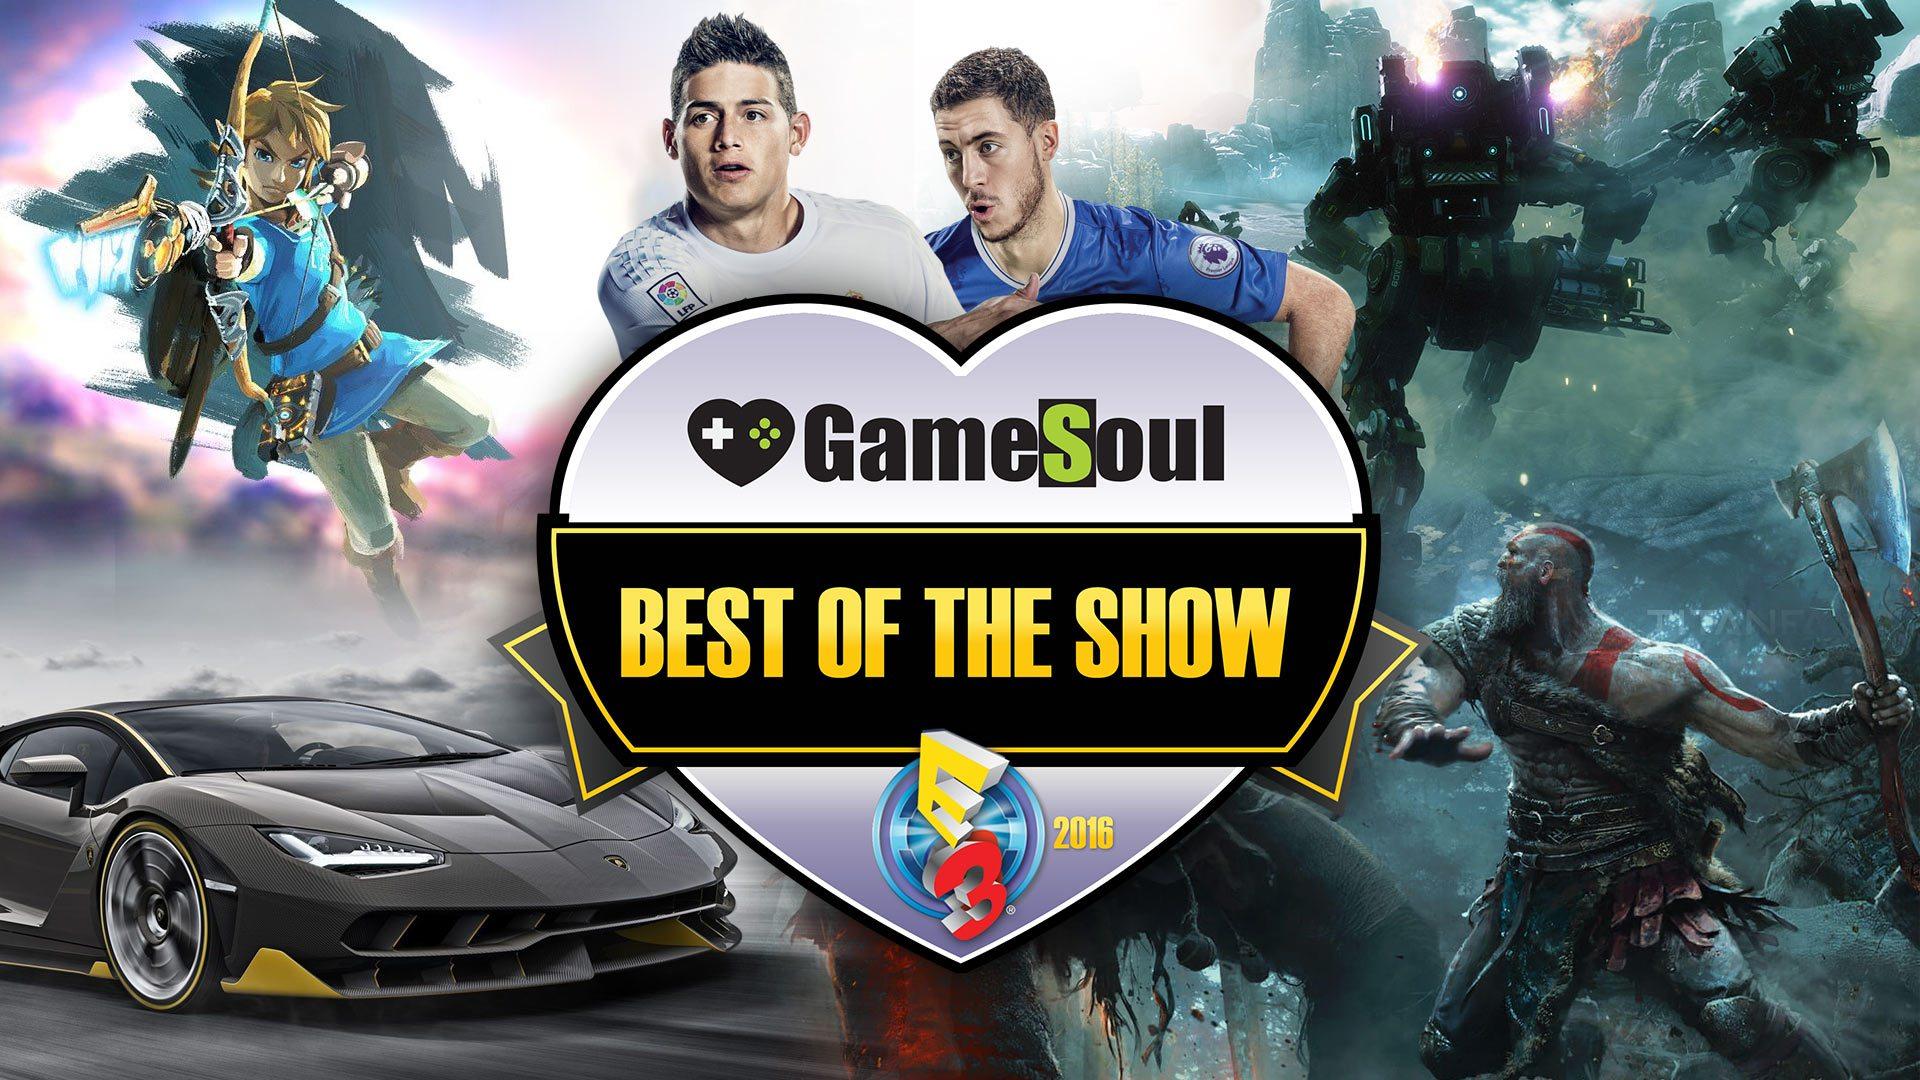 Best of E3 2016 - GameSoul